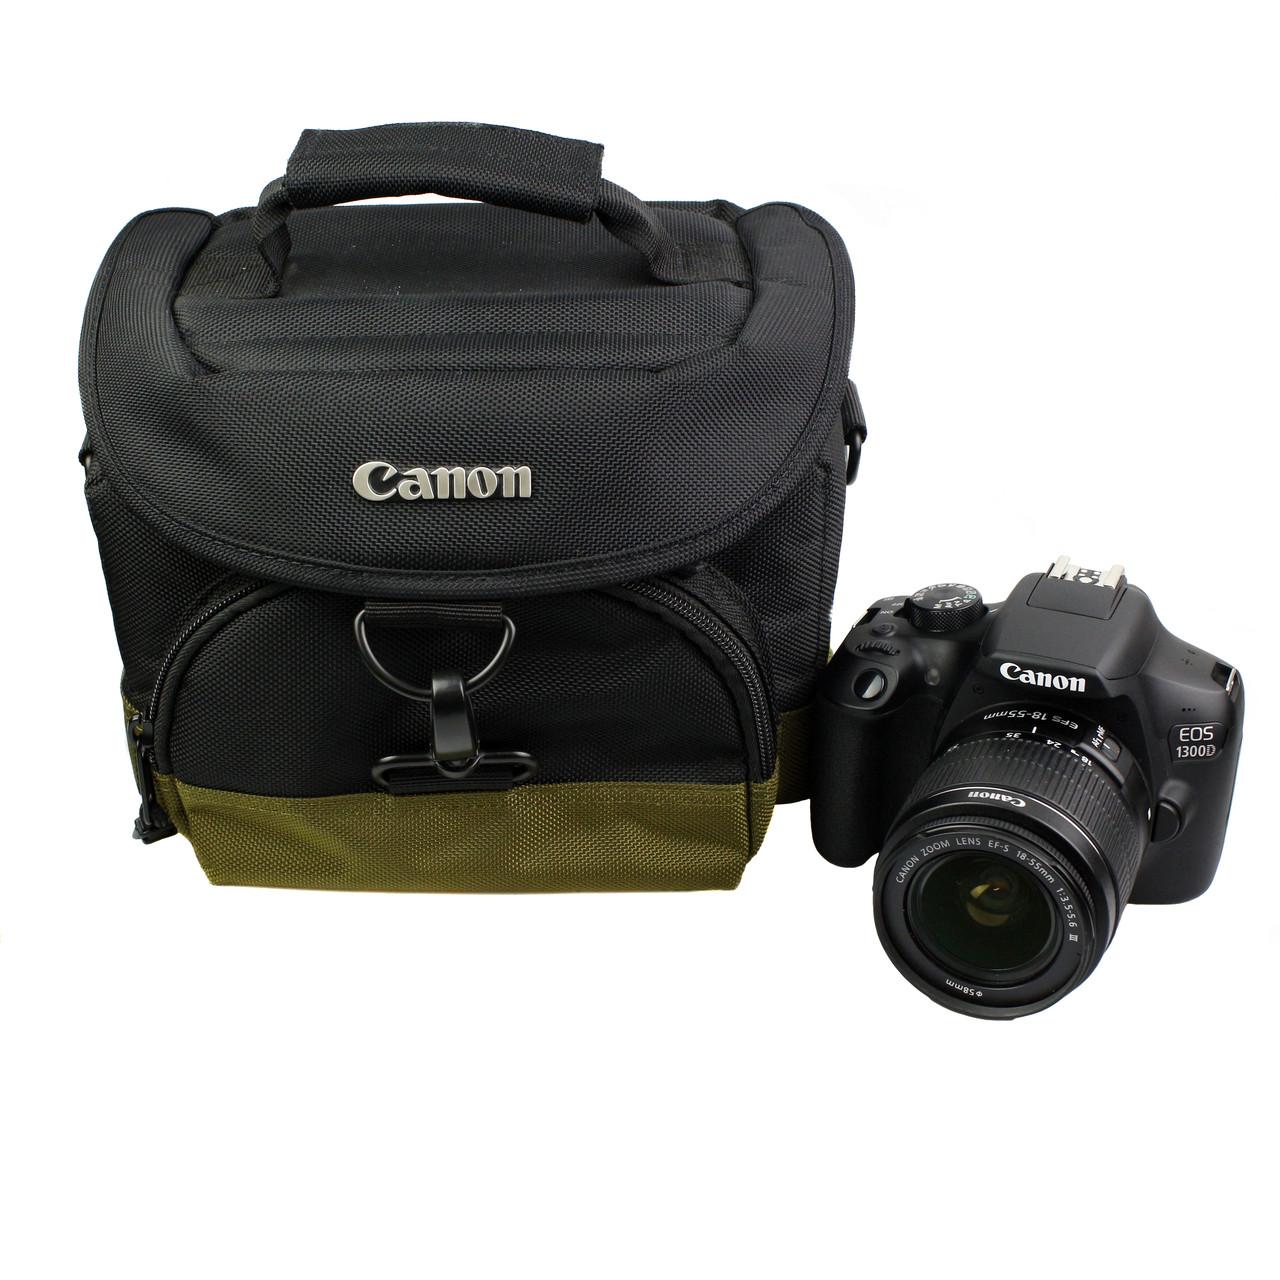 Фотоаппарат Canon EOS 1300D Kit 18-55mm DC III Повреждена упаковка / в магазине